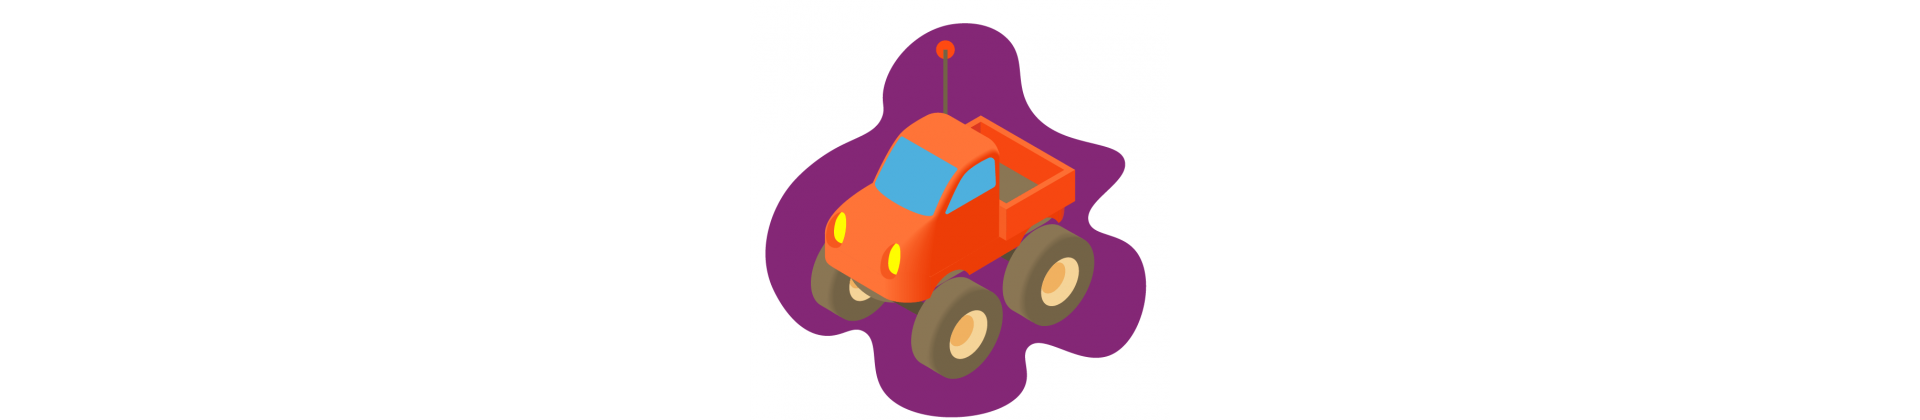 Circuits & véhicules